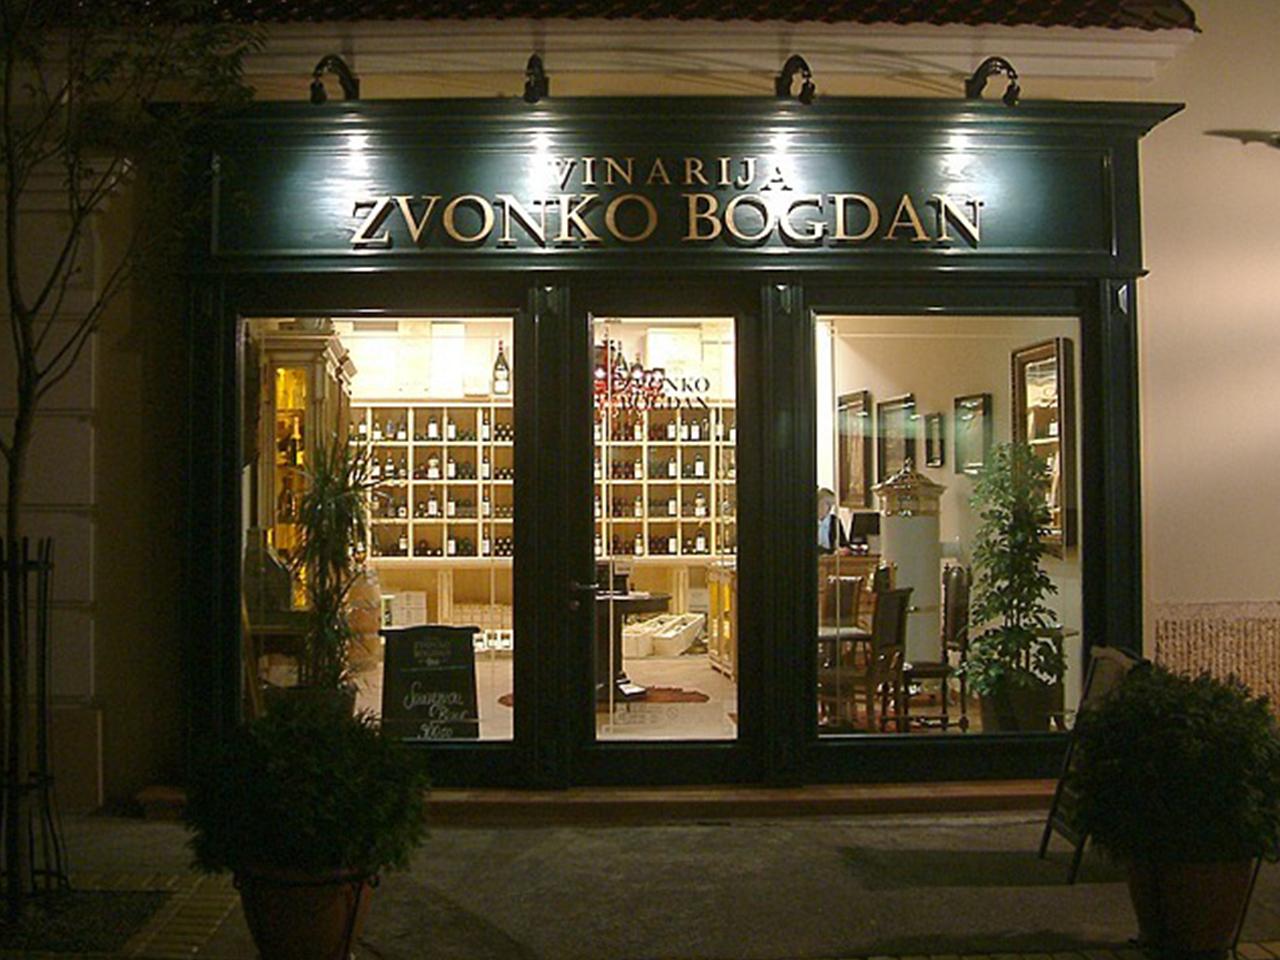 Vinarija-Zvonko-Bogdan